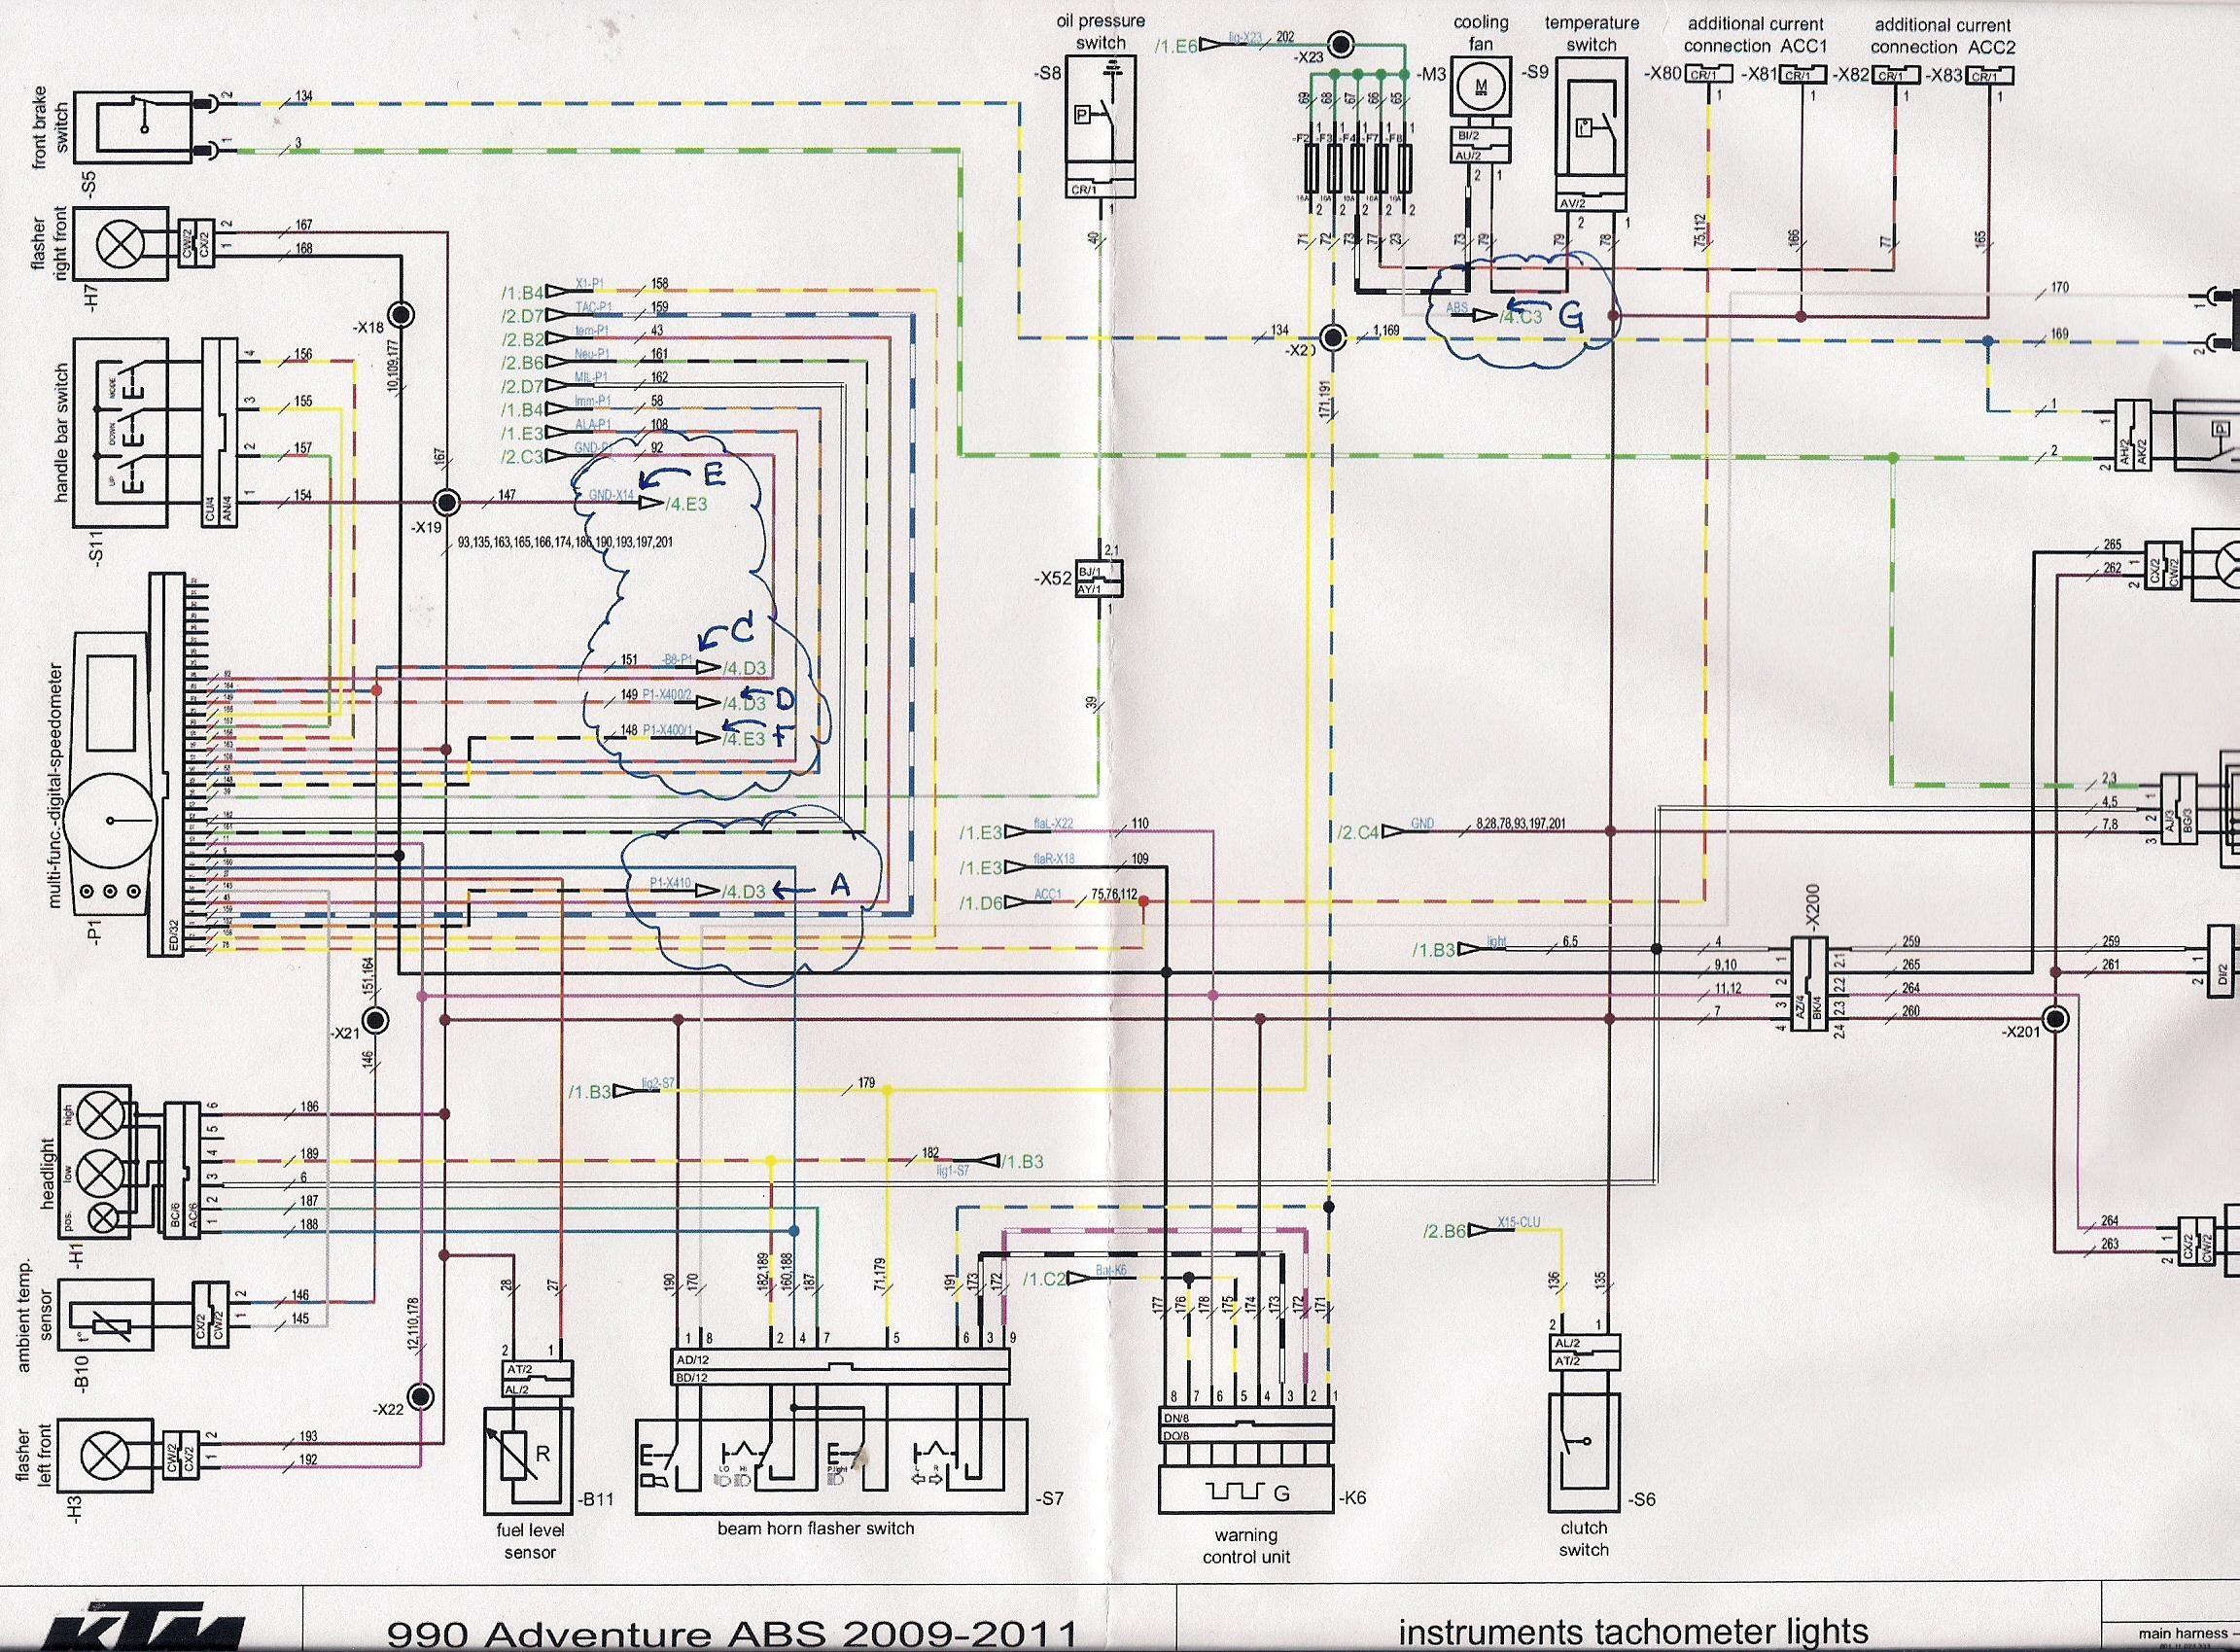 ktm 640 lc4 wiring diagram - seniorsclub.it layout-drink -  layout-drink.seniorsclub.it  diagram database